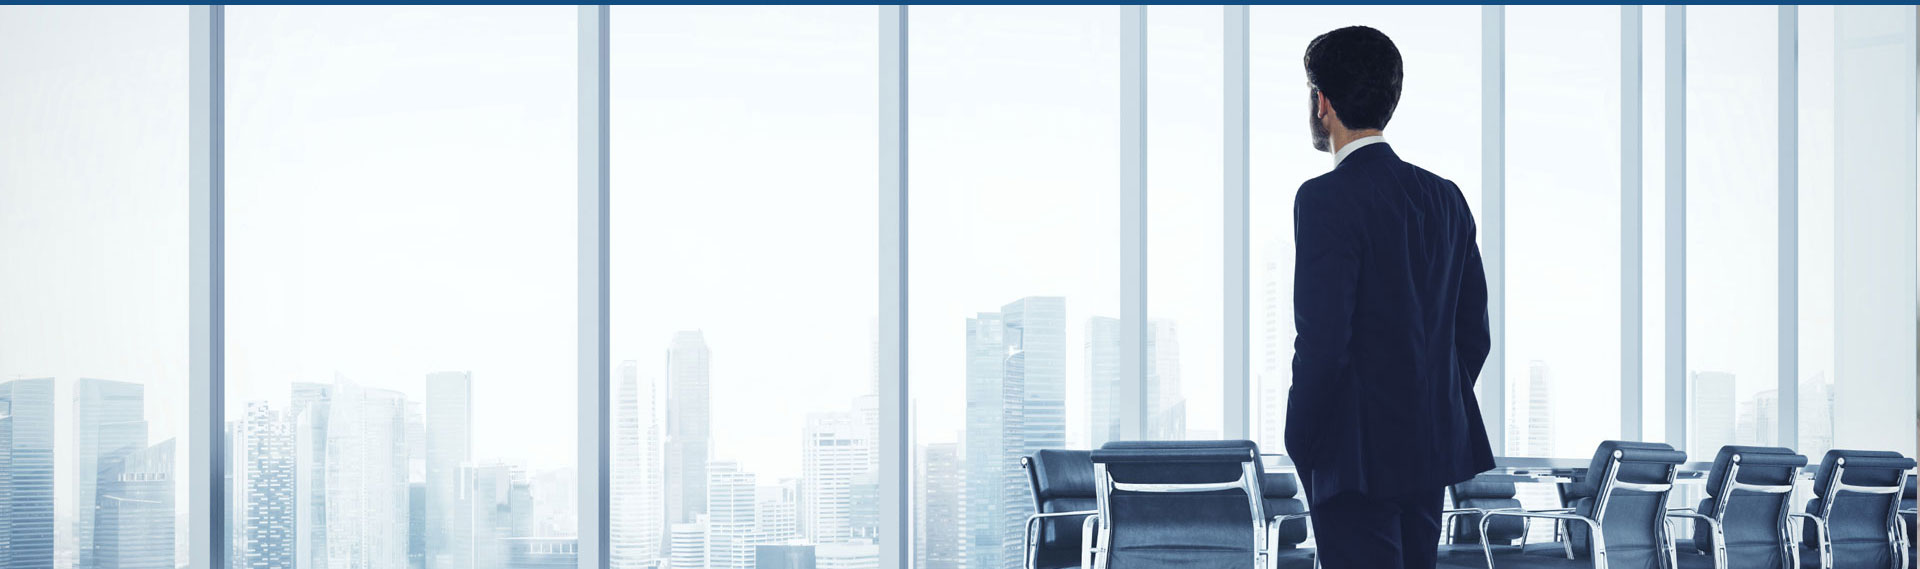 businessman-looking-window-900x267